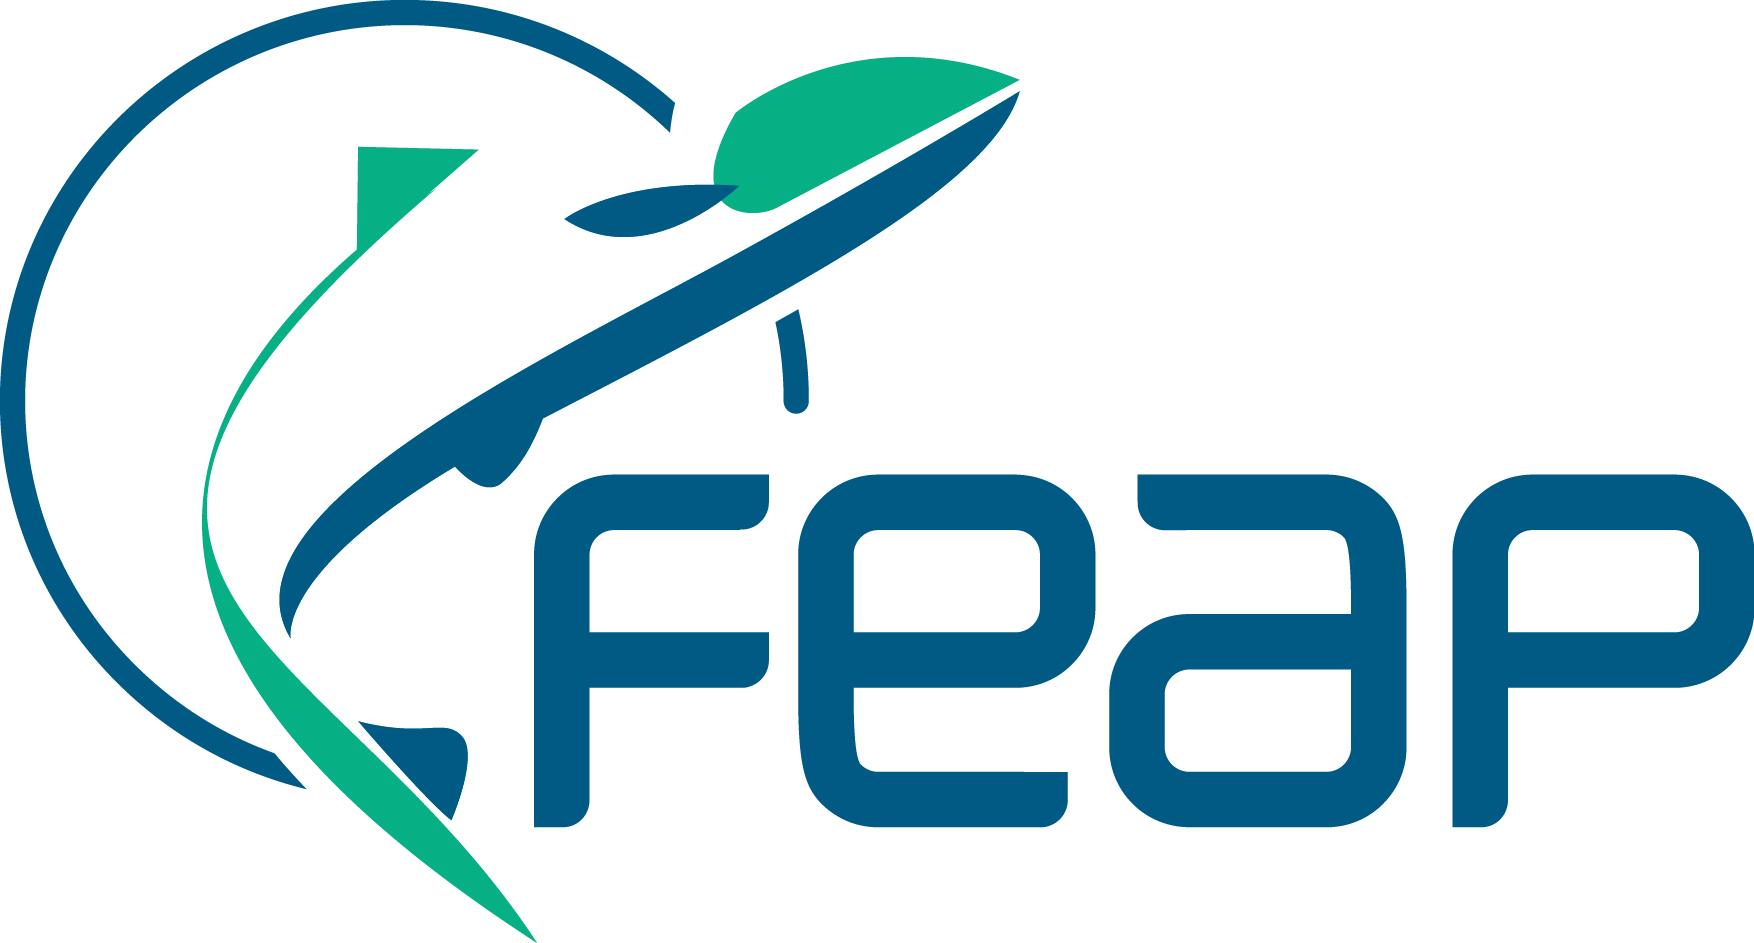 The Federation of European Aquaculture Producers